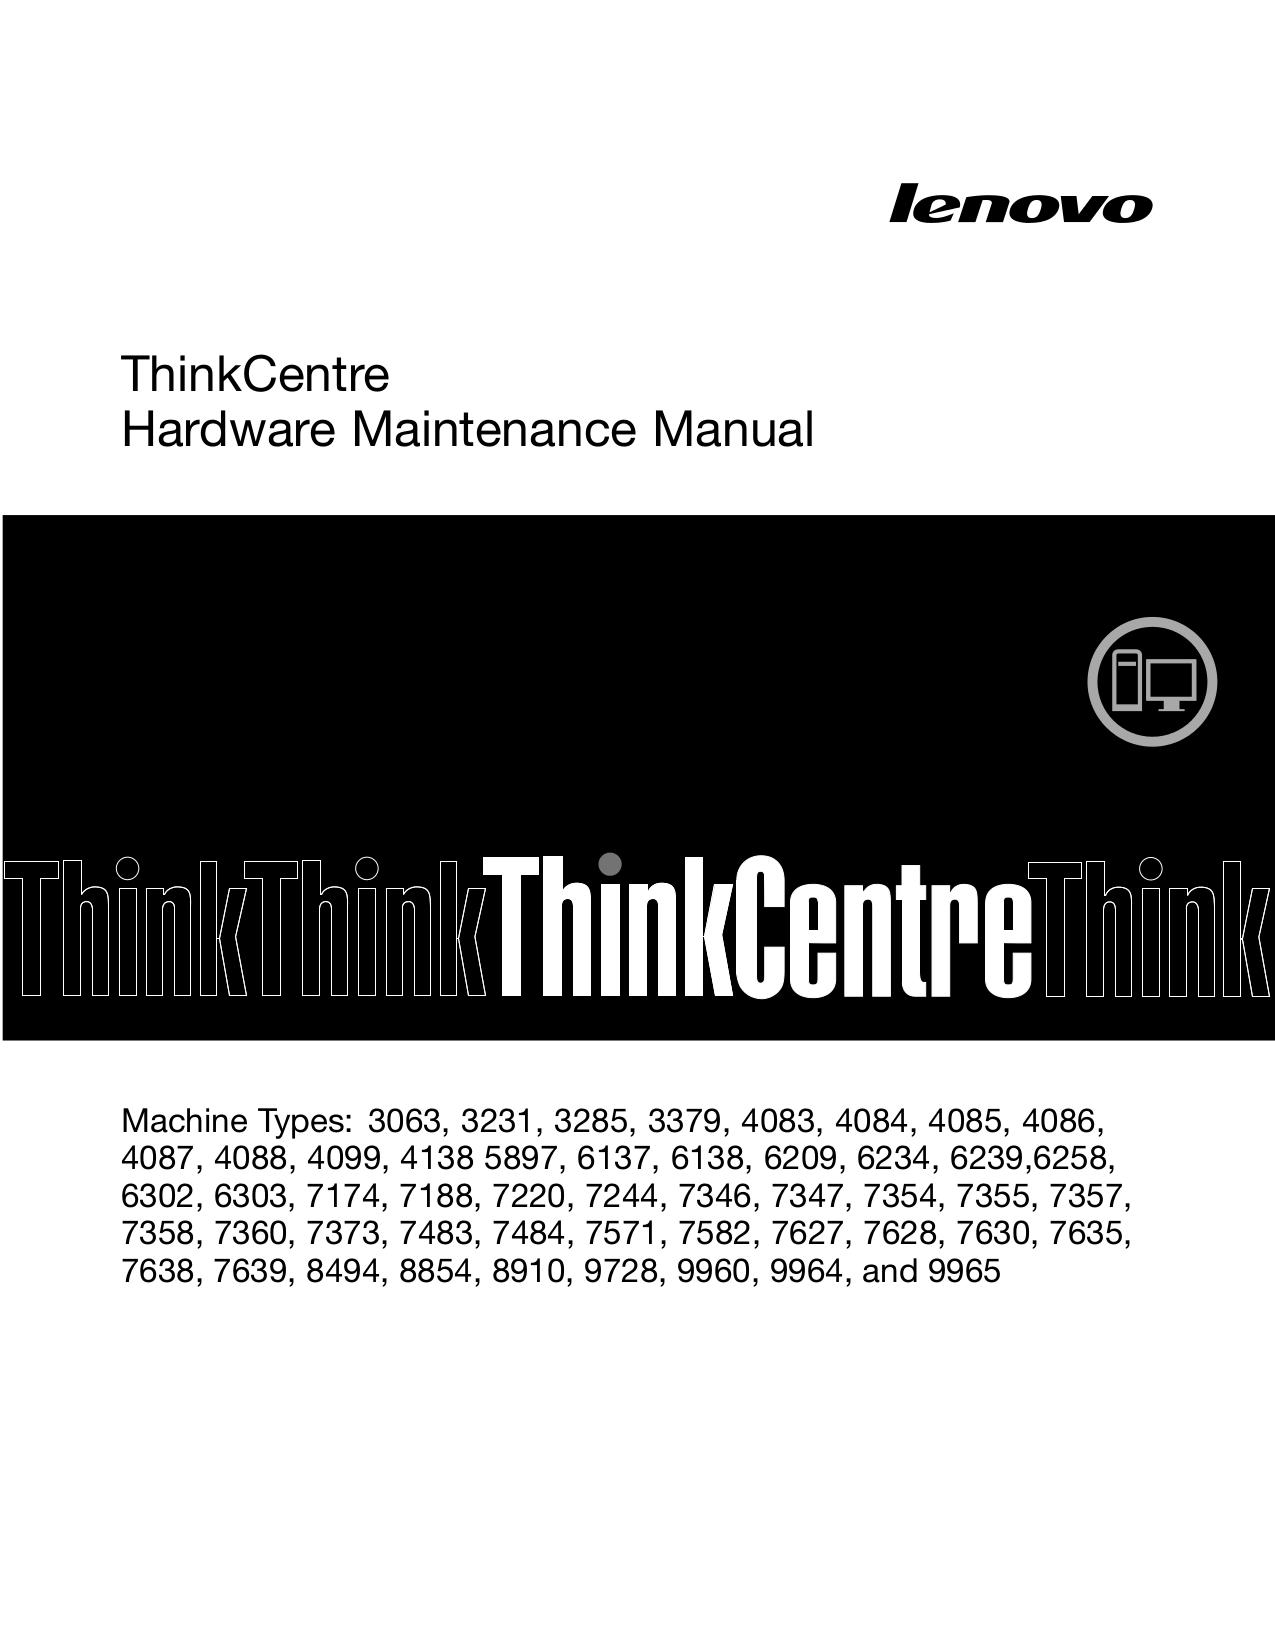 pdf for Lenovo Desktop ThinkCentre M58p 7483 manual